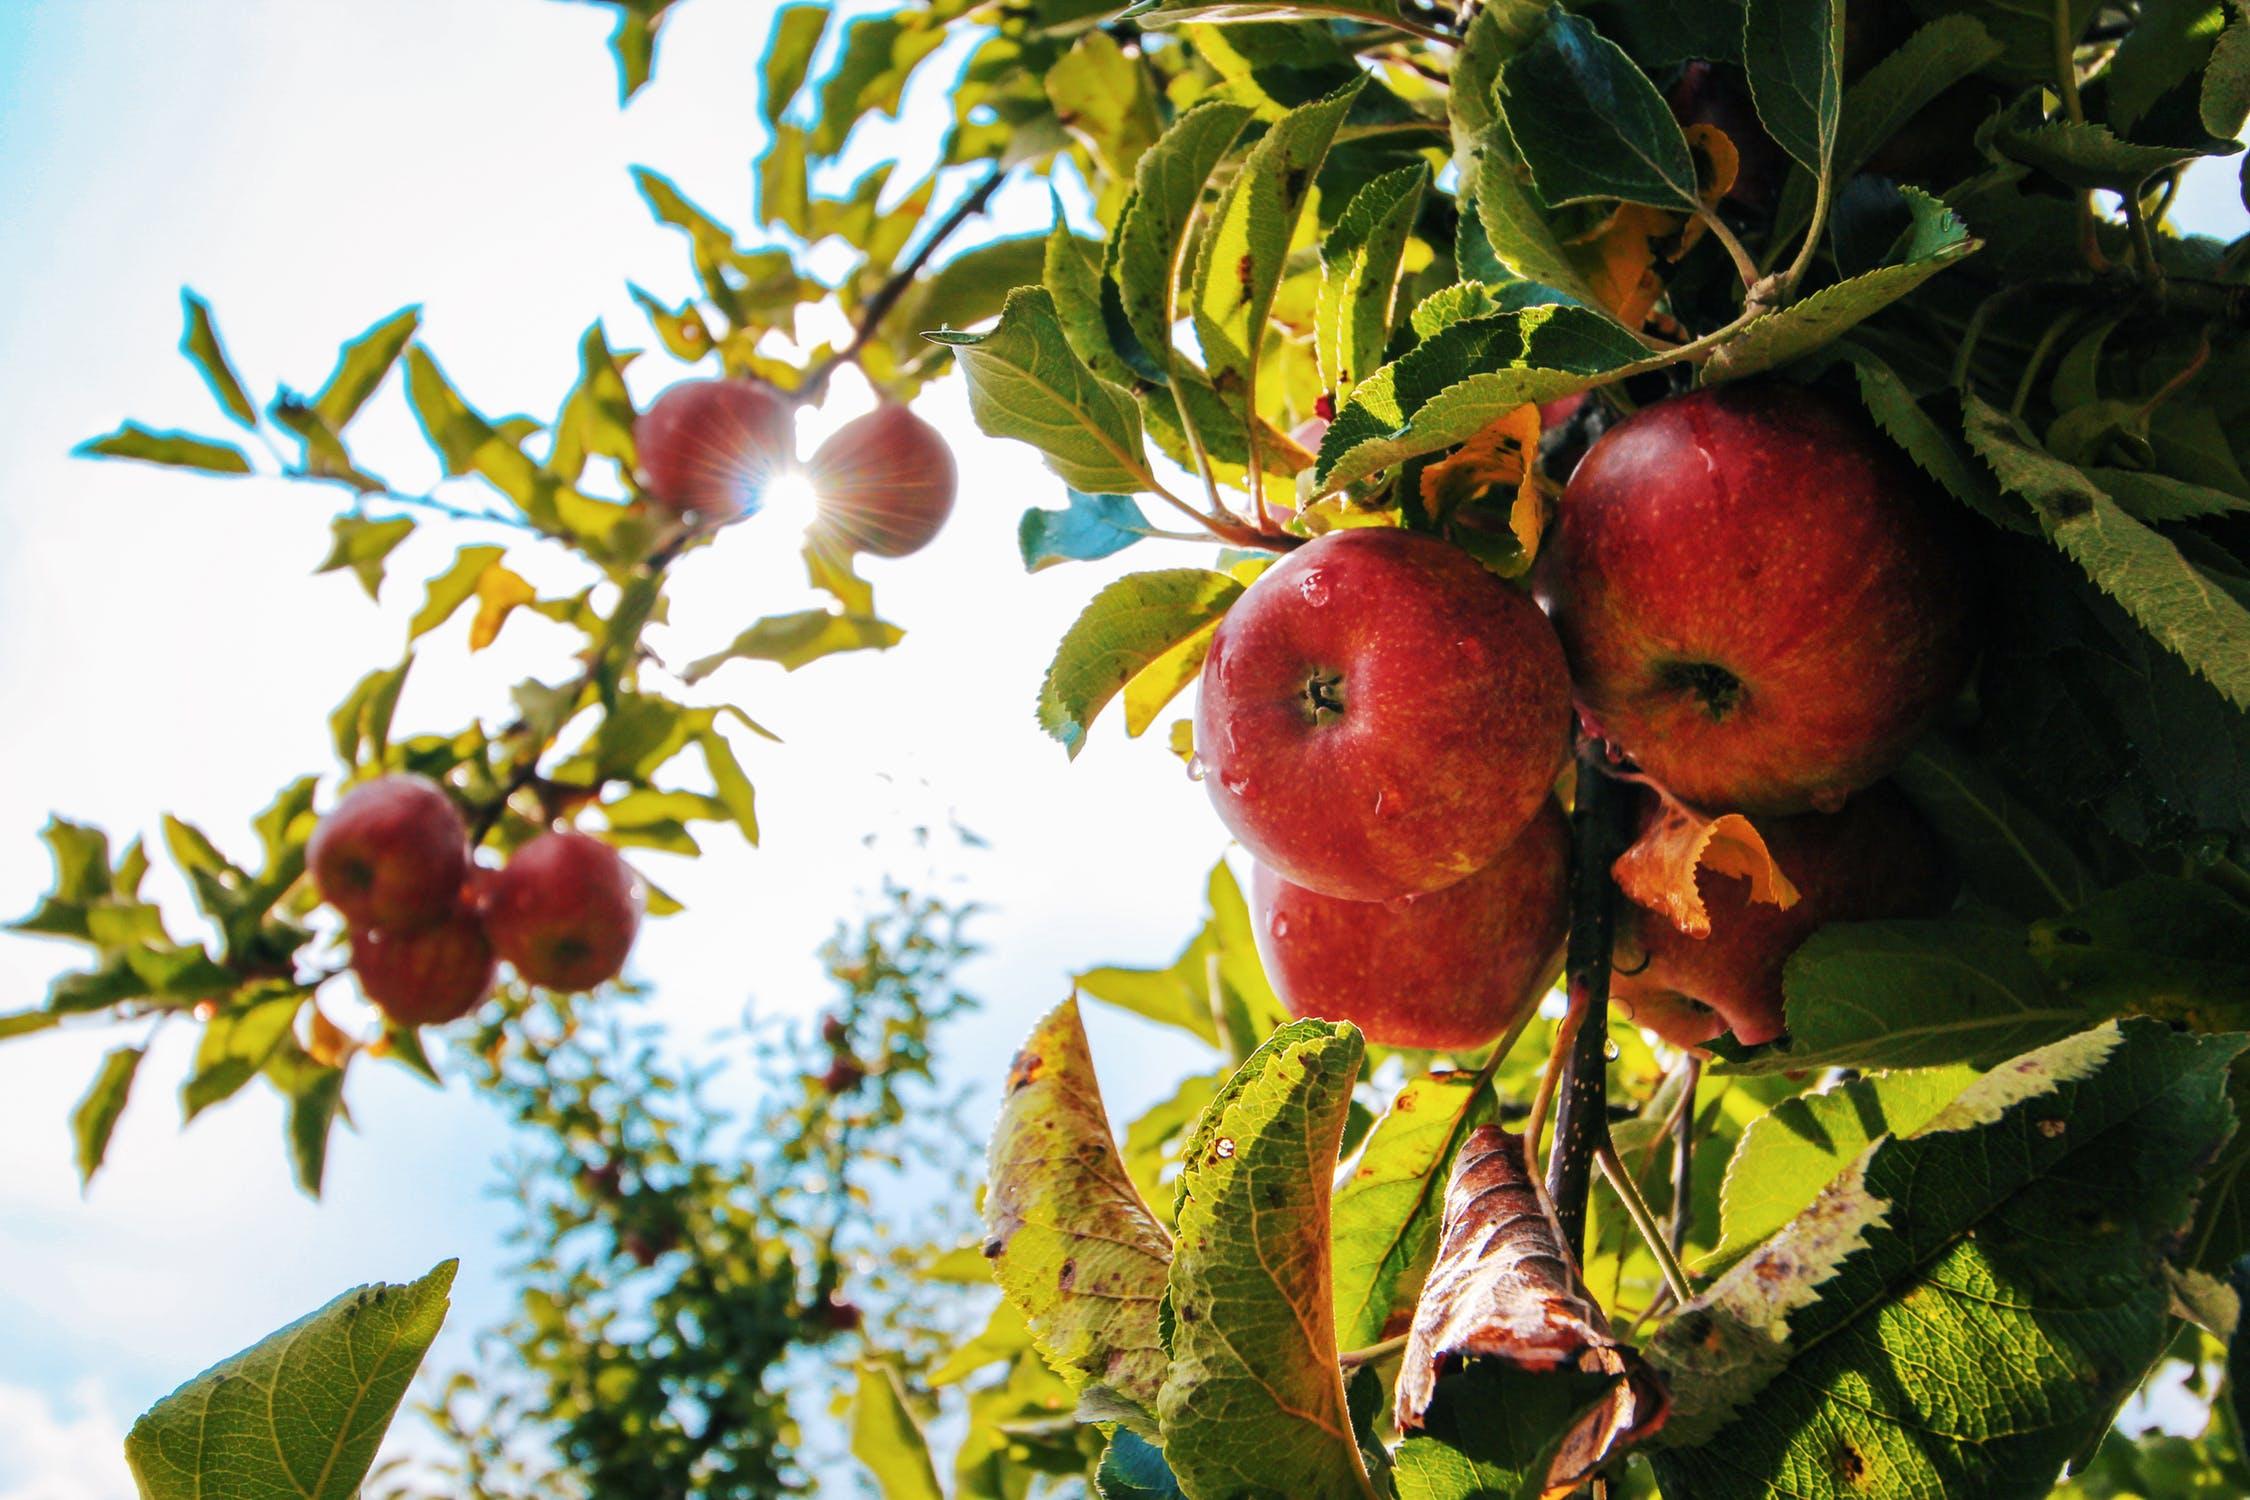 apple = แอปเปิ้ล